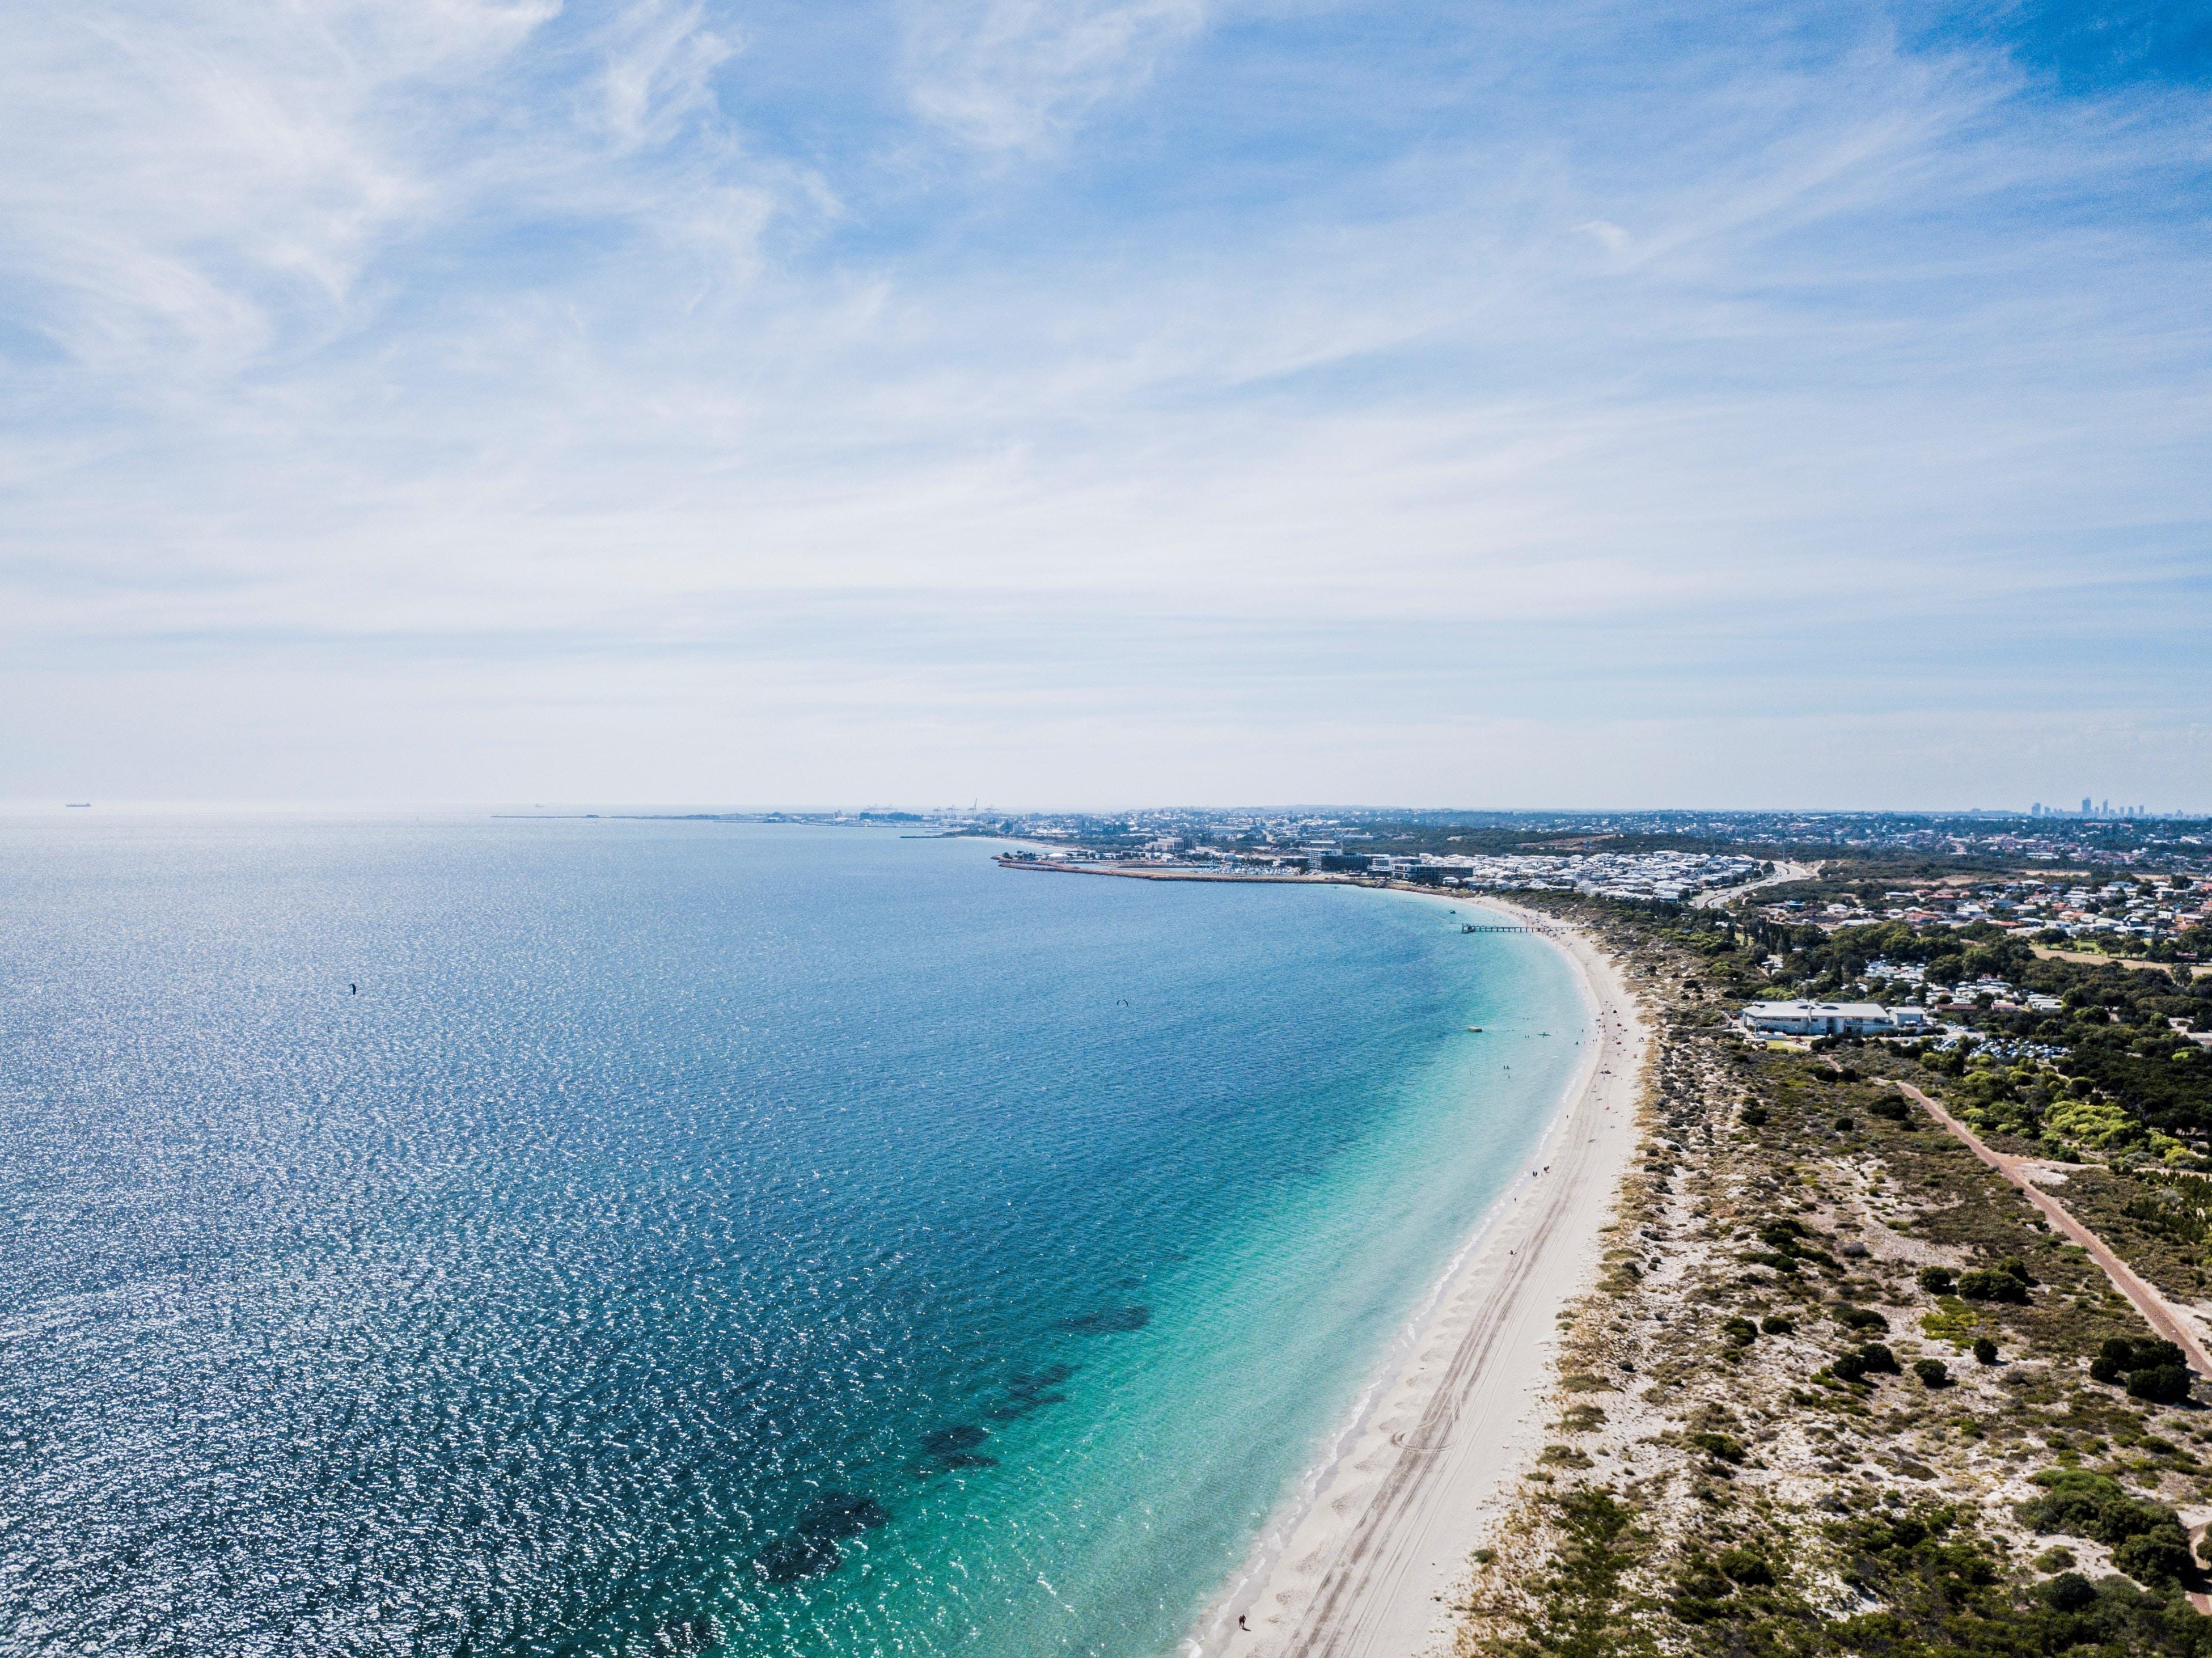 aerial photo of long seashore